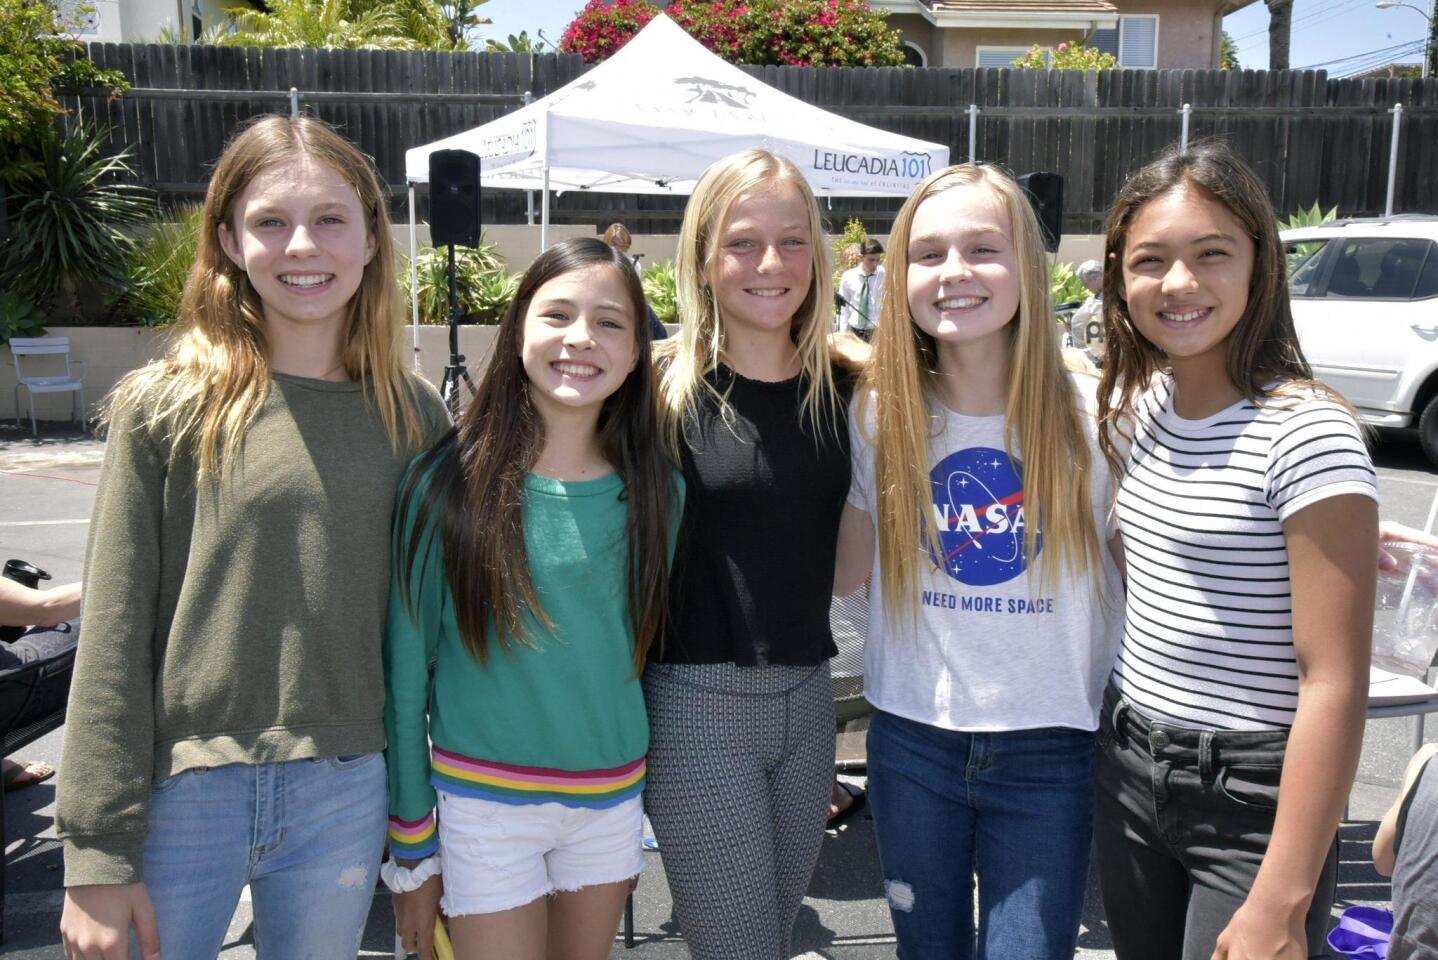 Warner, Kate, Mason, Sonya, Liana